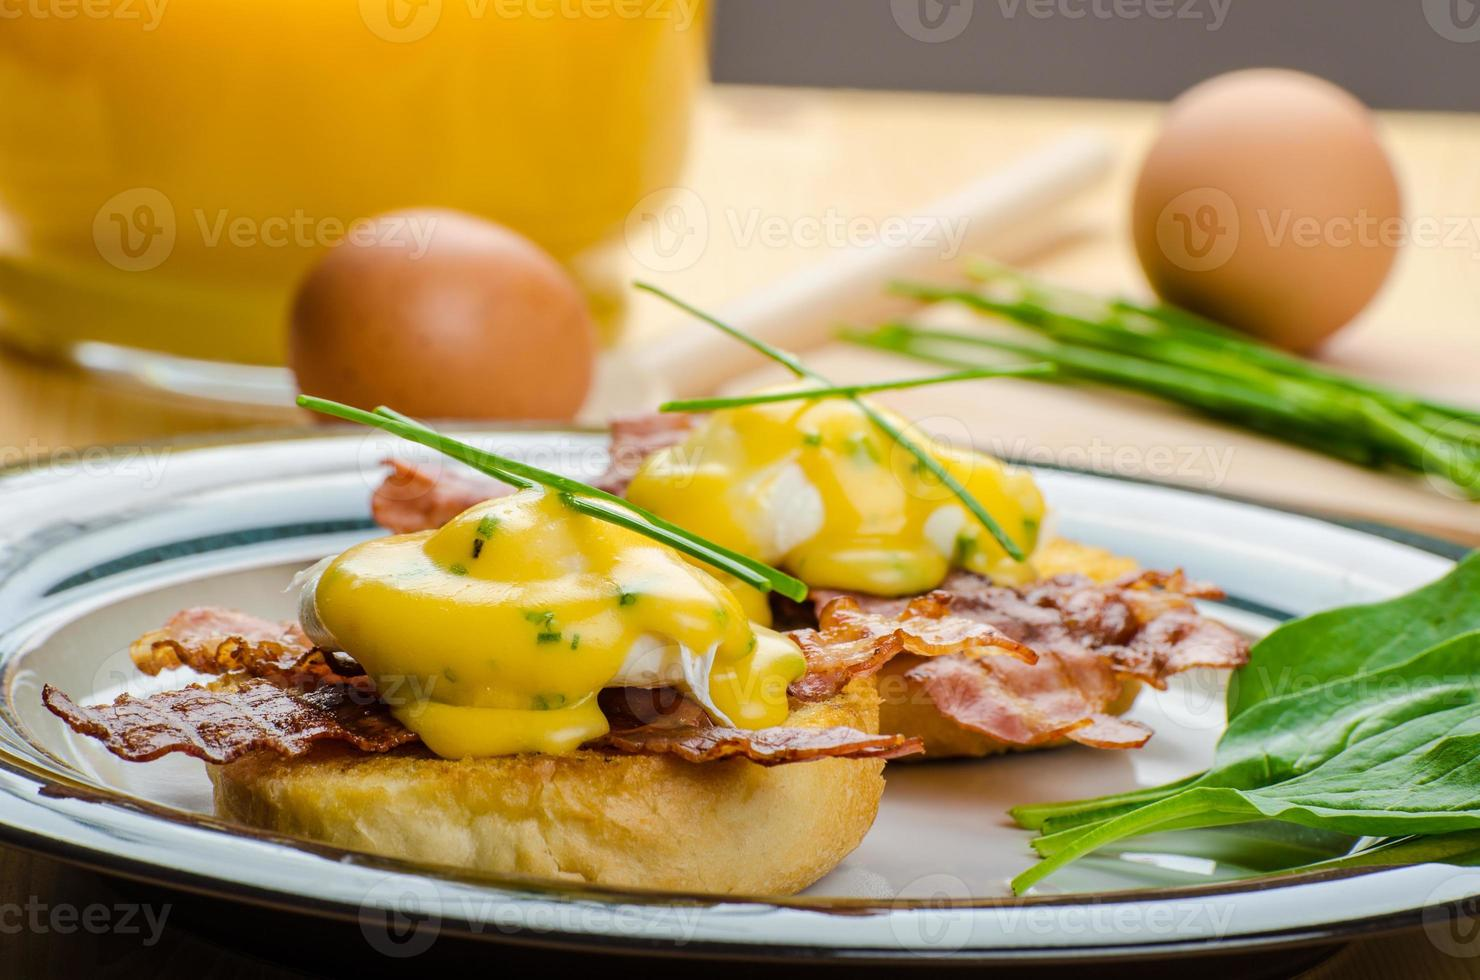 Eggs bvenedict with chives photo